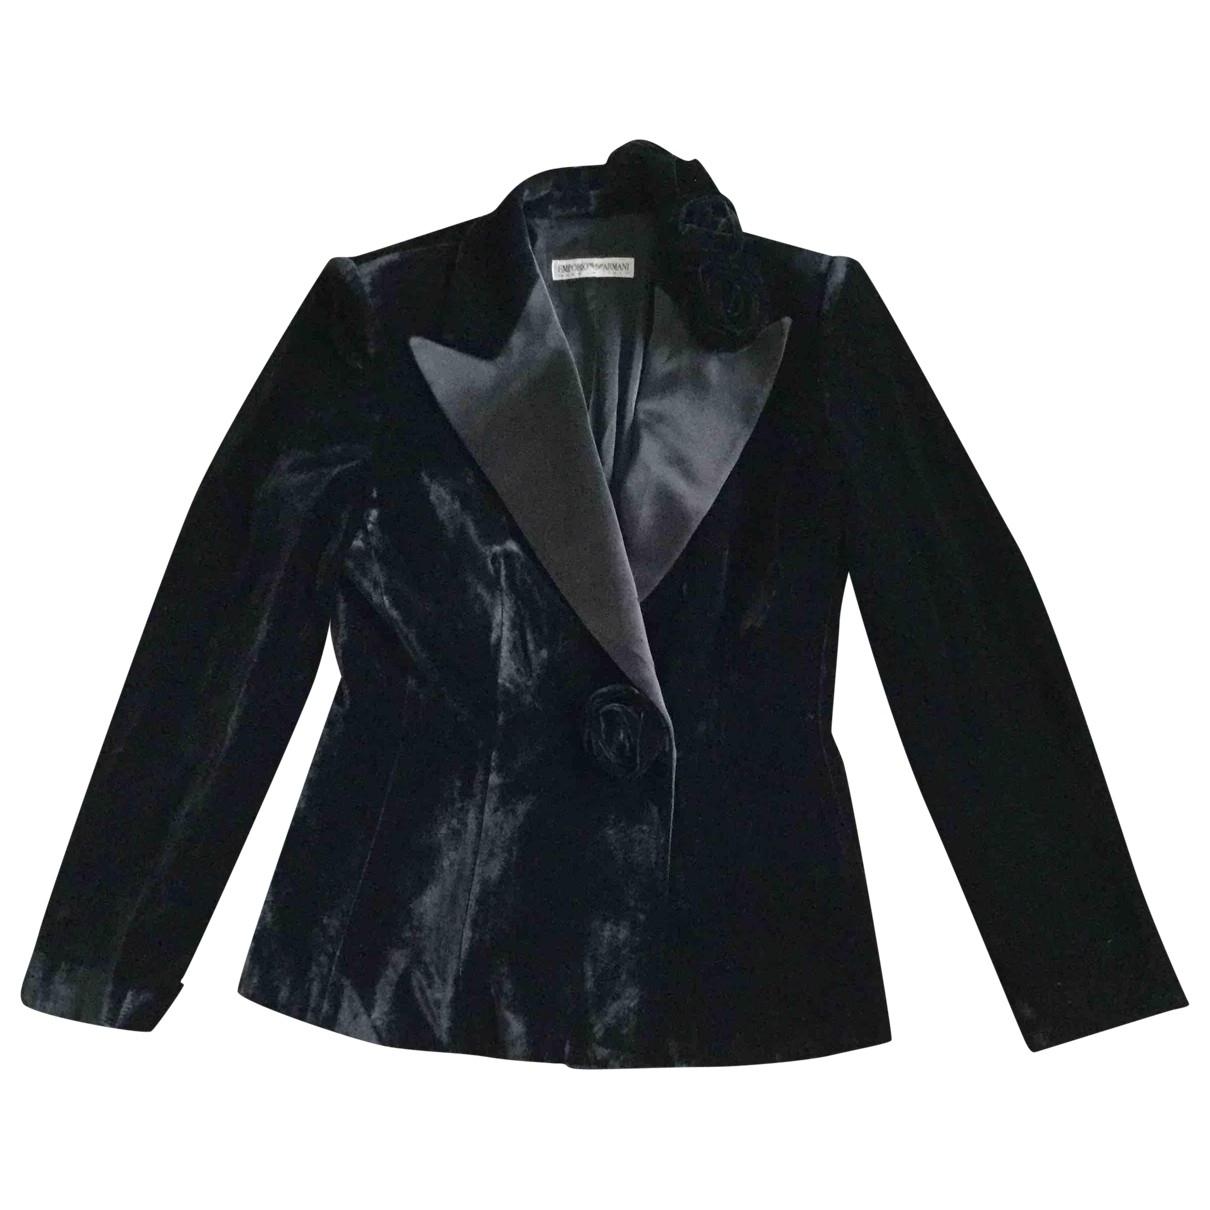 Emporio Armani \N Black jacket for Women 40 IT